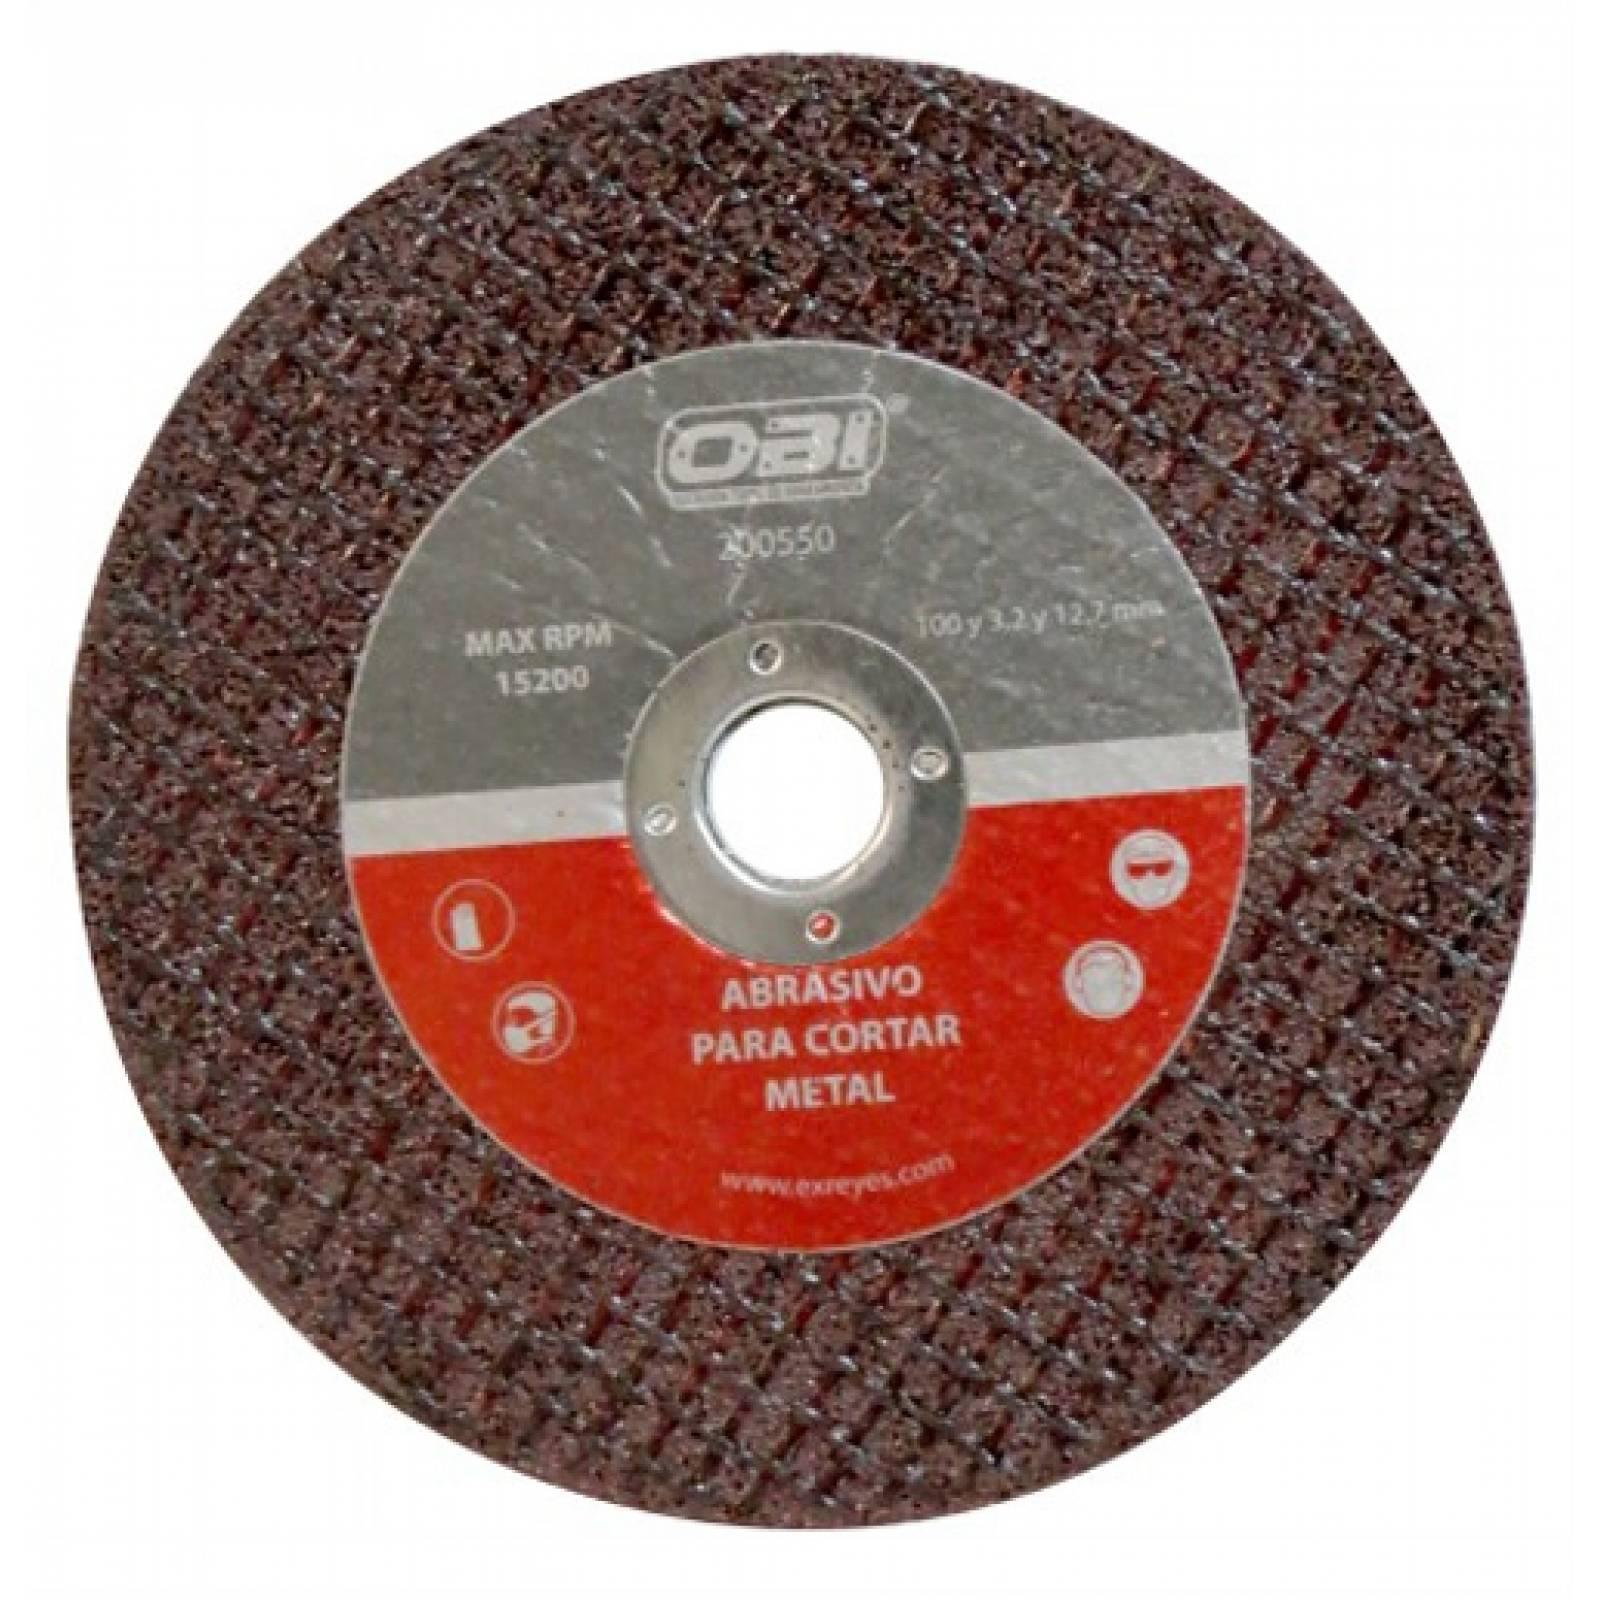 Abrasivo Metal 105 Y 3 Y 13 Mm Corte Obi